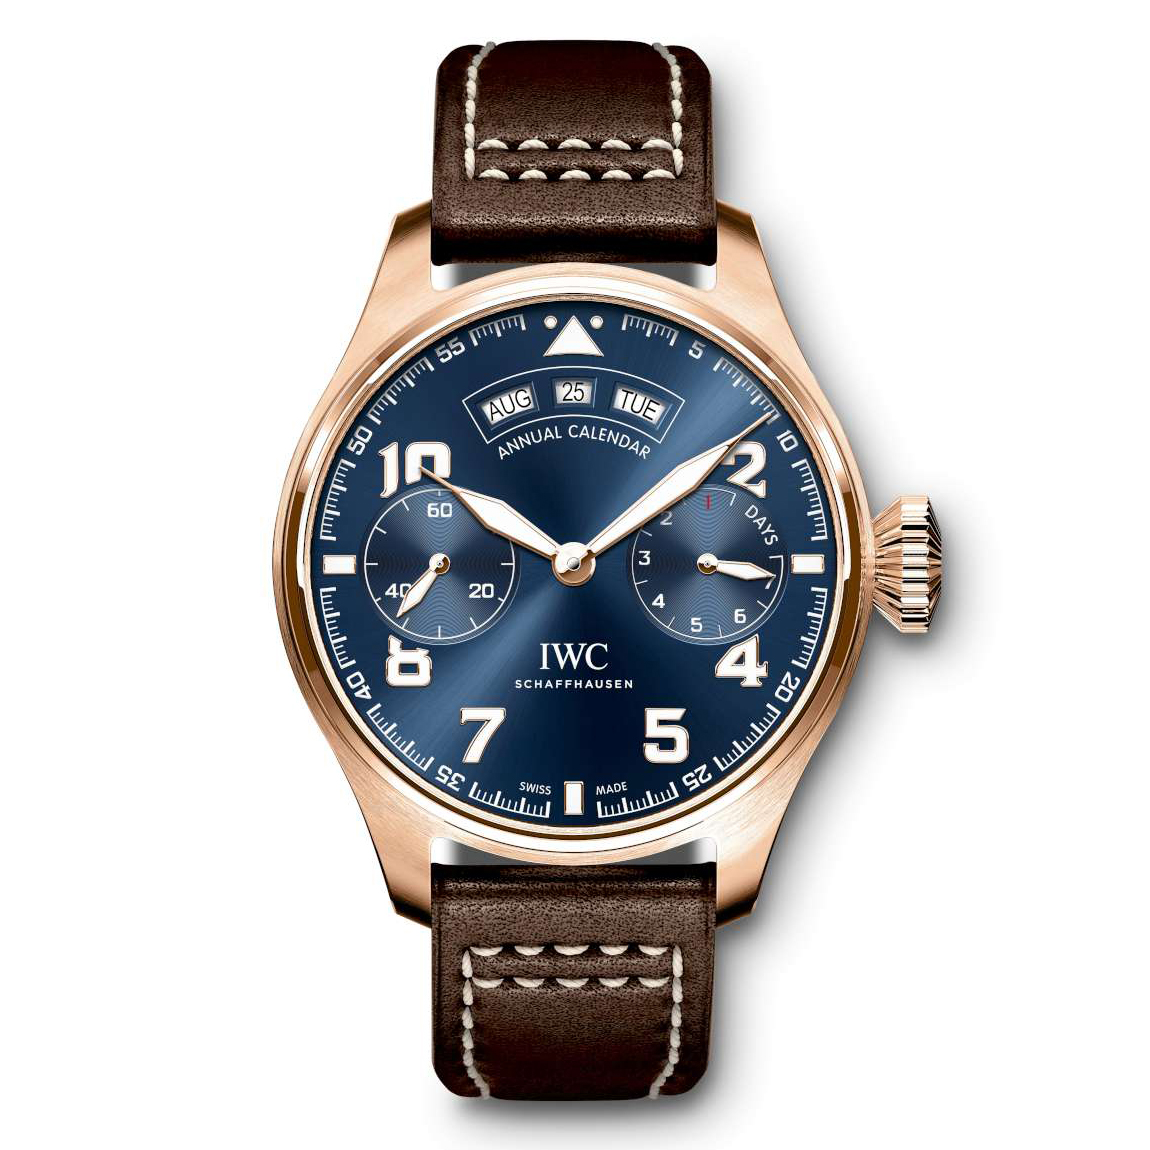 Big Pilot's Watch Annual Calendar Edition